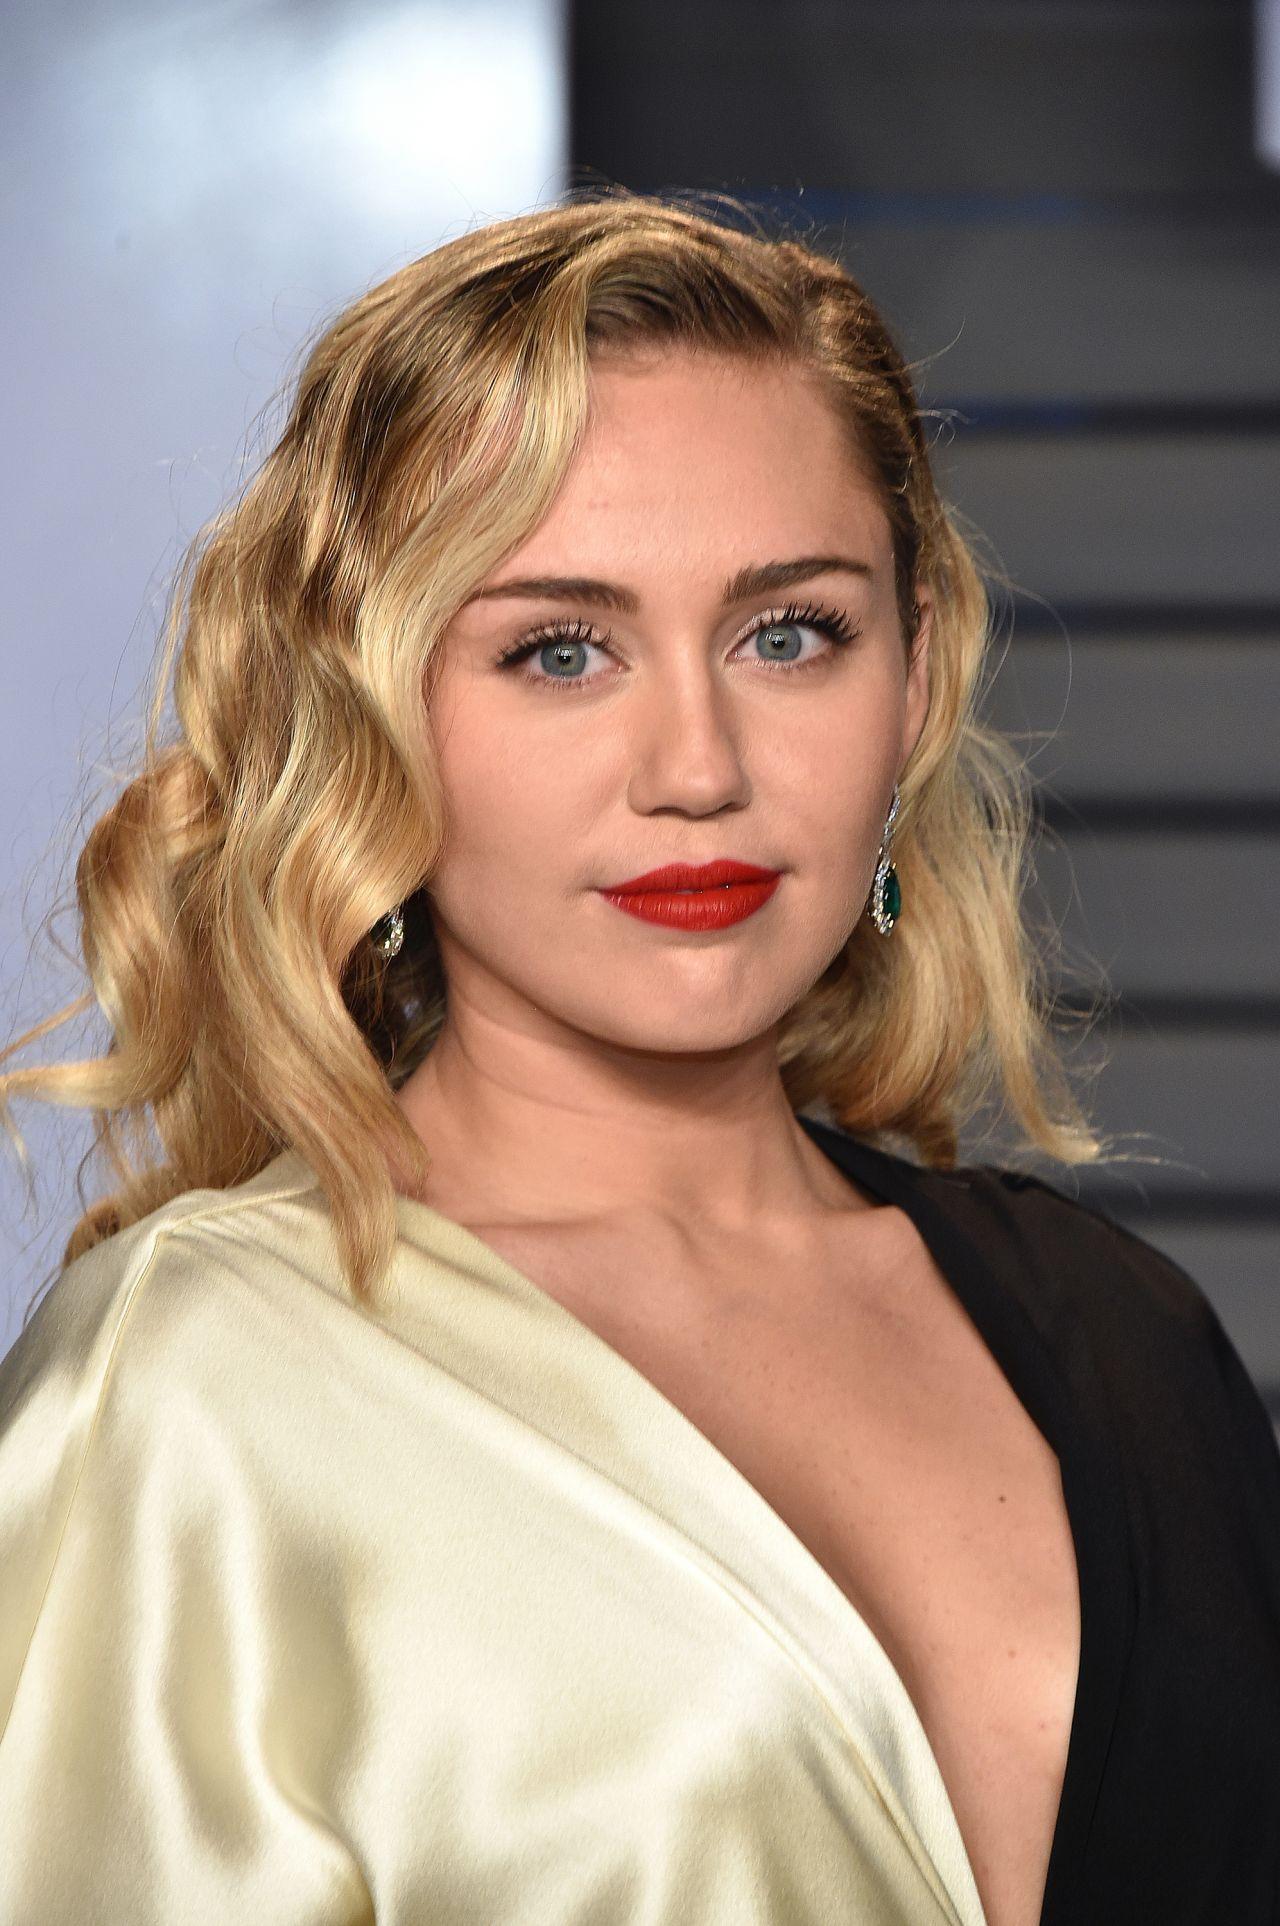 Miley cyrus bangerz tour 2014 ass booty slap - 1 part 3